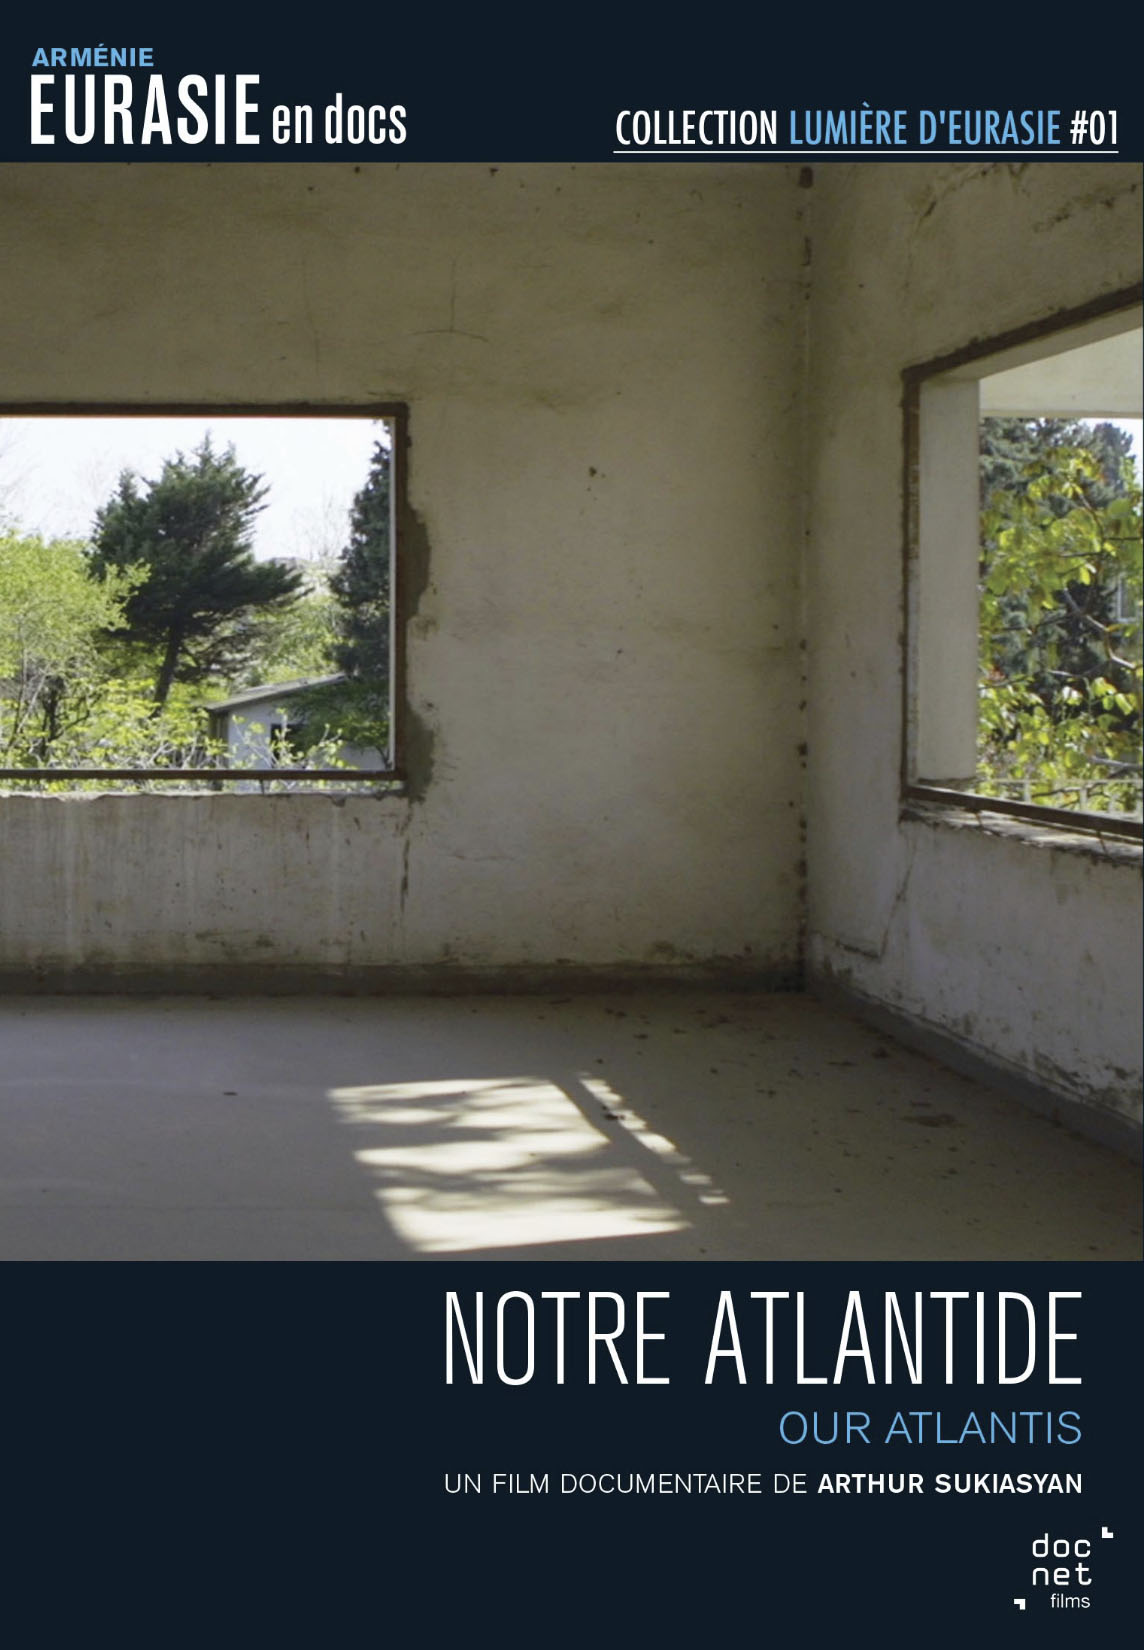 notre-atlantide-Arthur-Sukiasyan